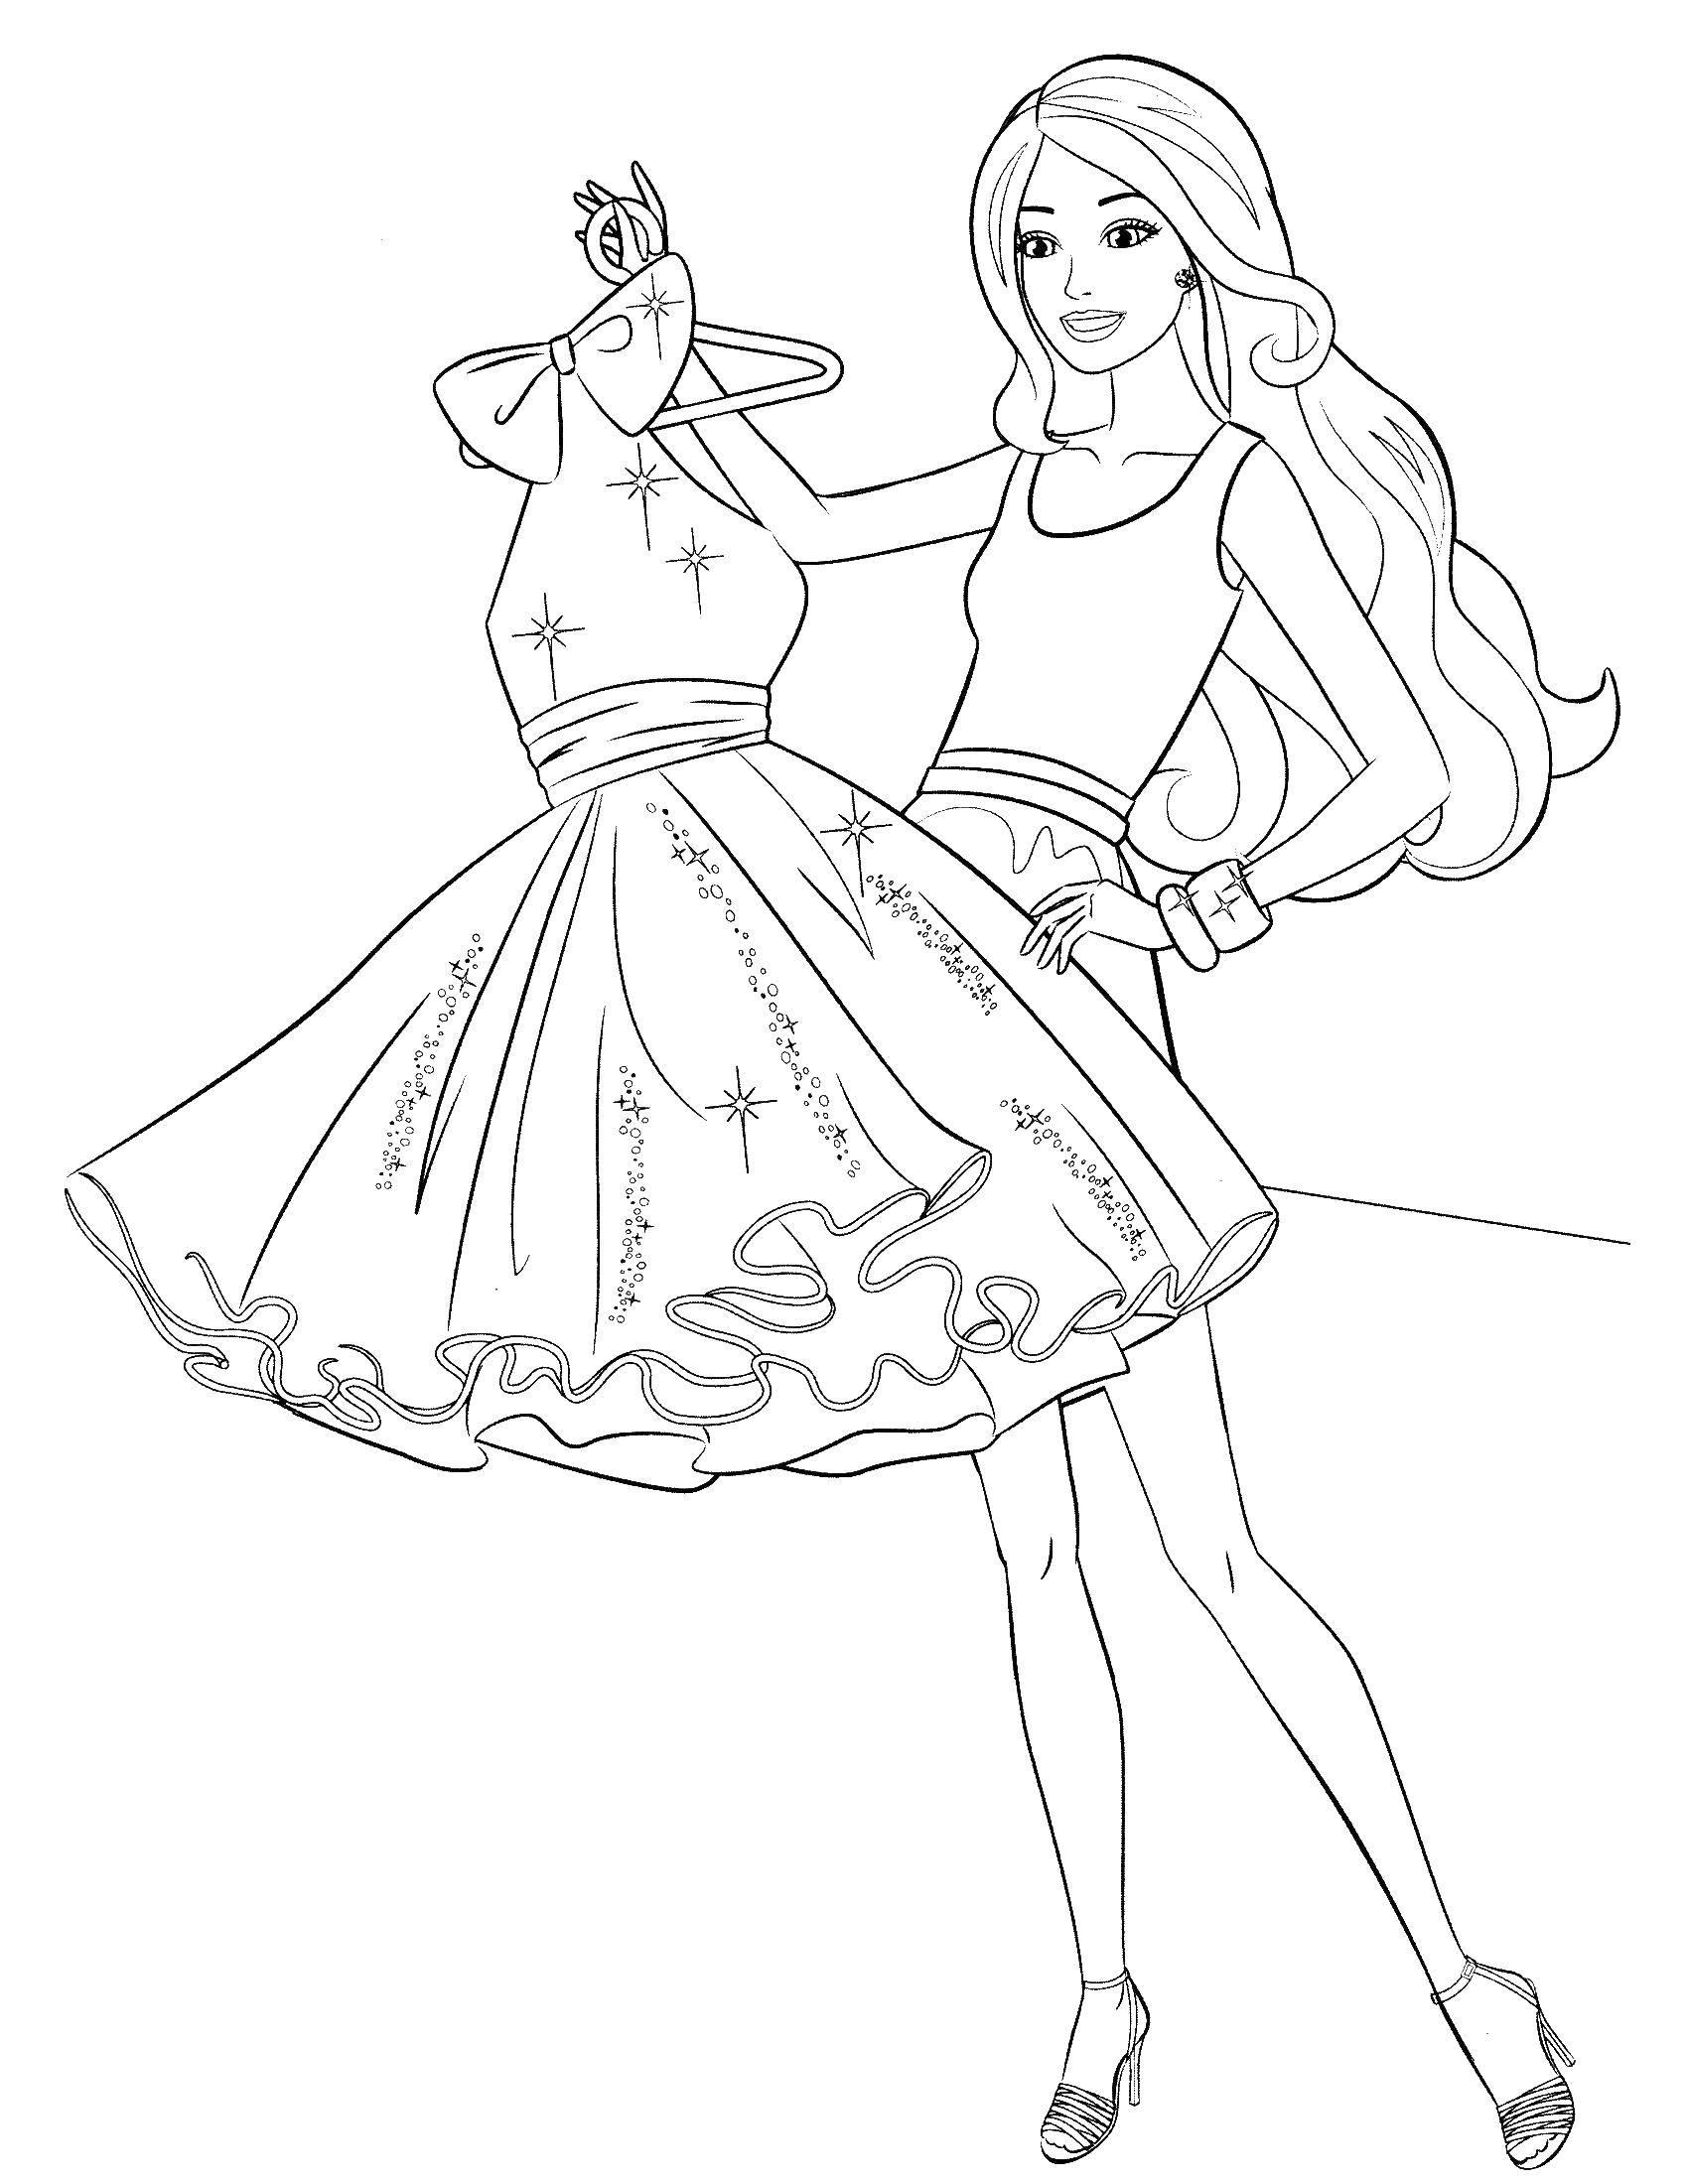 Раскраски Барби, Раскраска Барби и подружки барби.